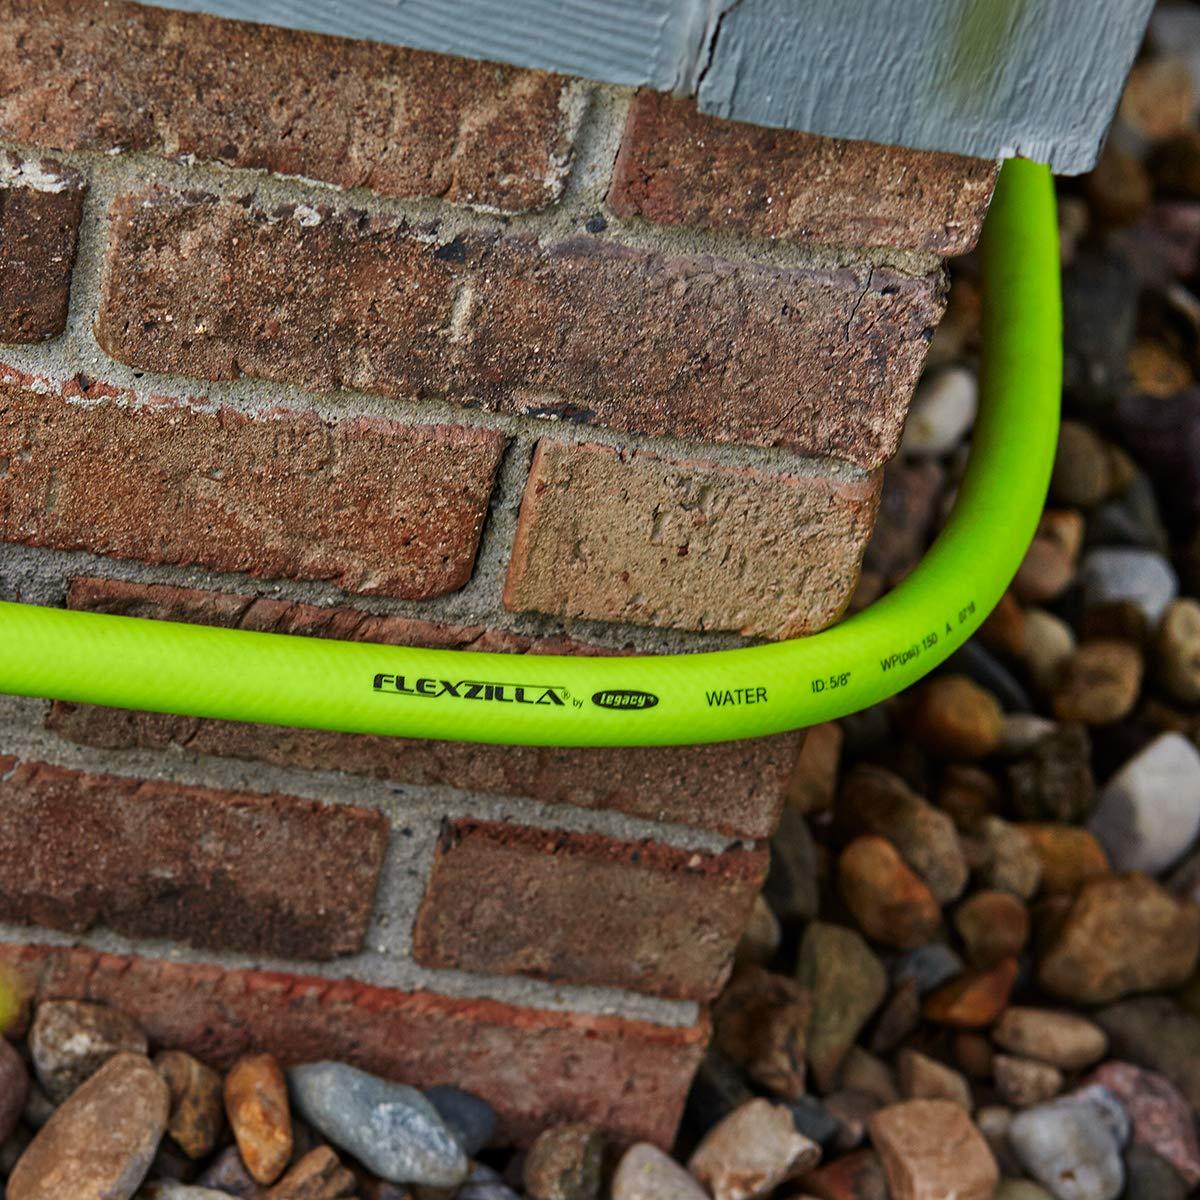 Flexzilla Garden Lead-in Hose 5/8 in. x 50 ft, 50' (feet) HFZG550YW by Flexzilla (Image #5)